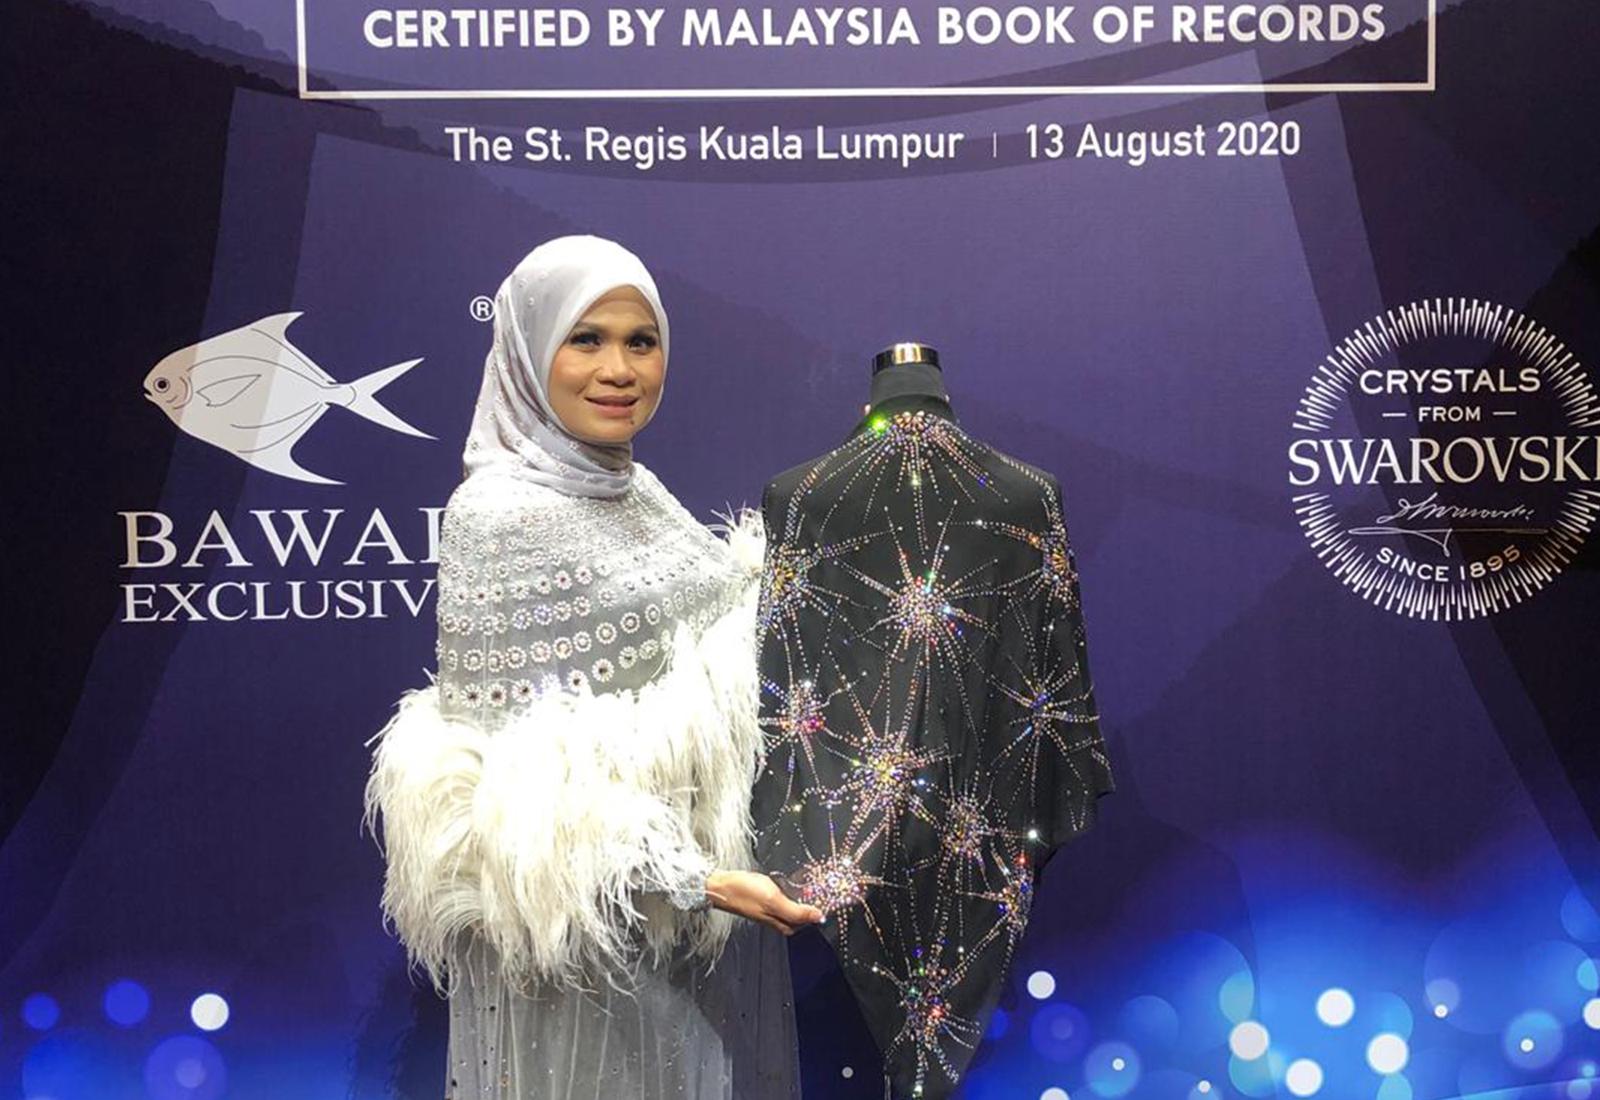 Photo of Tercatat Dalam MBOR, Tudung Bawal Exclusive Bernilai RM100,000